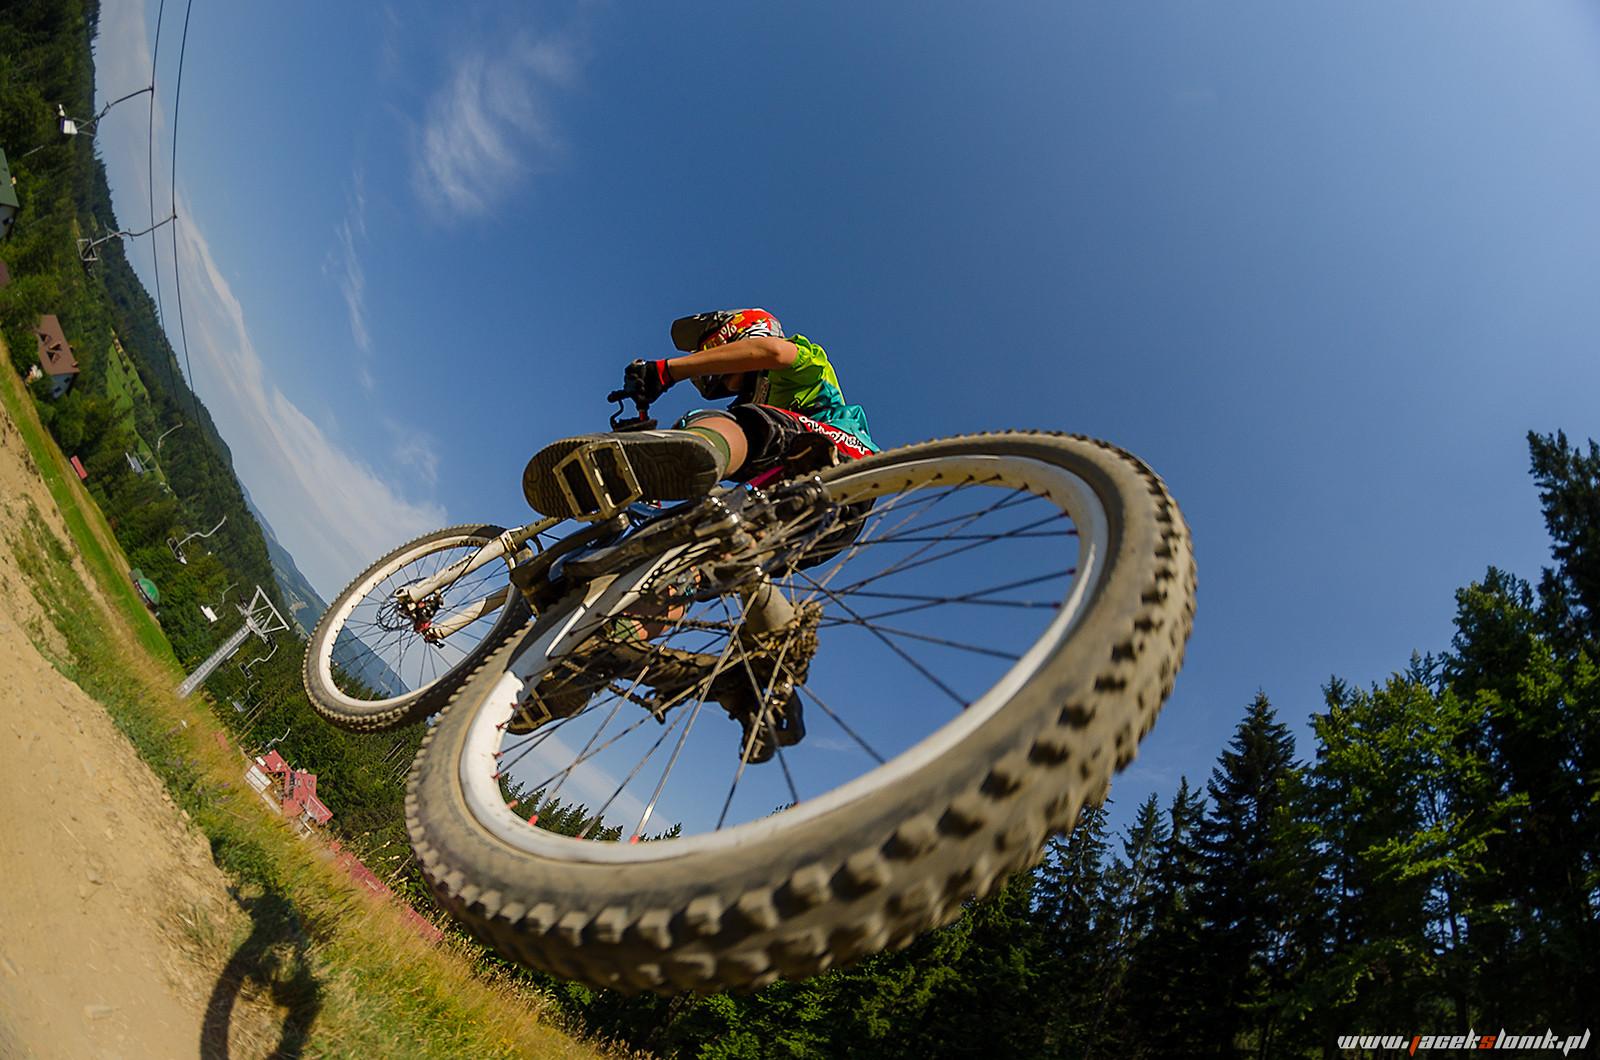 Let's whip it! - JacekSlonik - Mountain Biking Pictures - Vital MTB